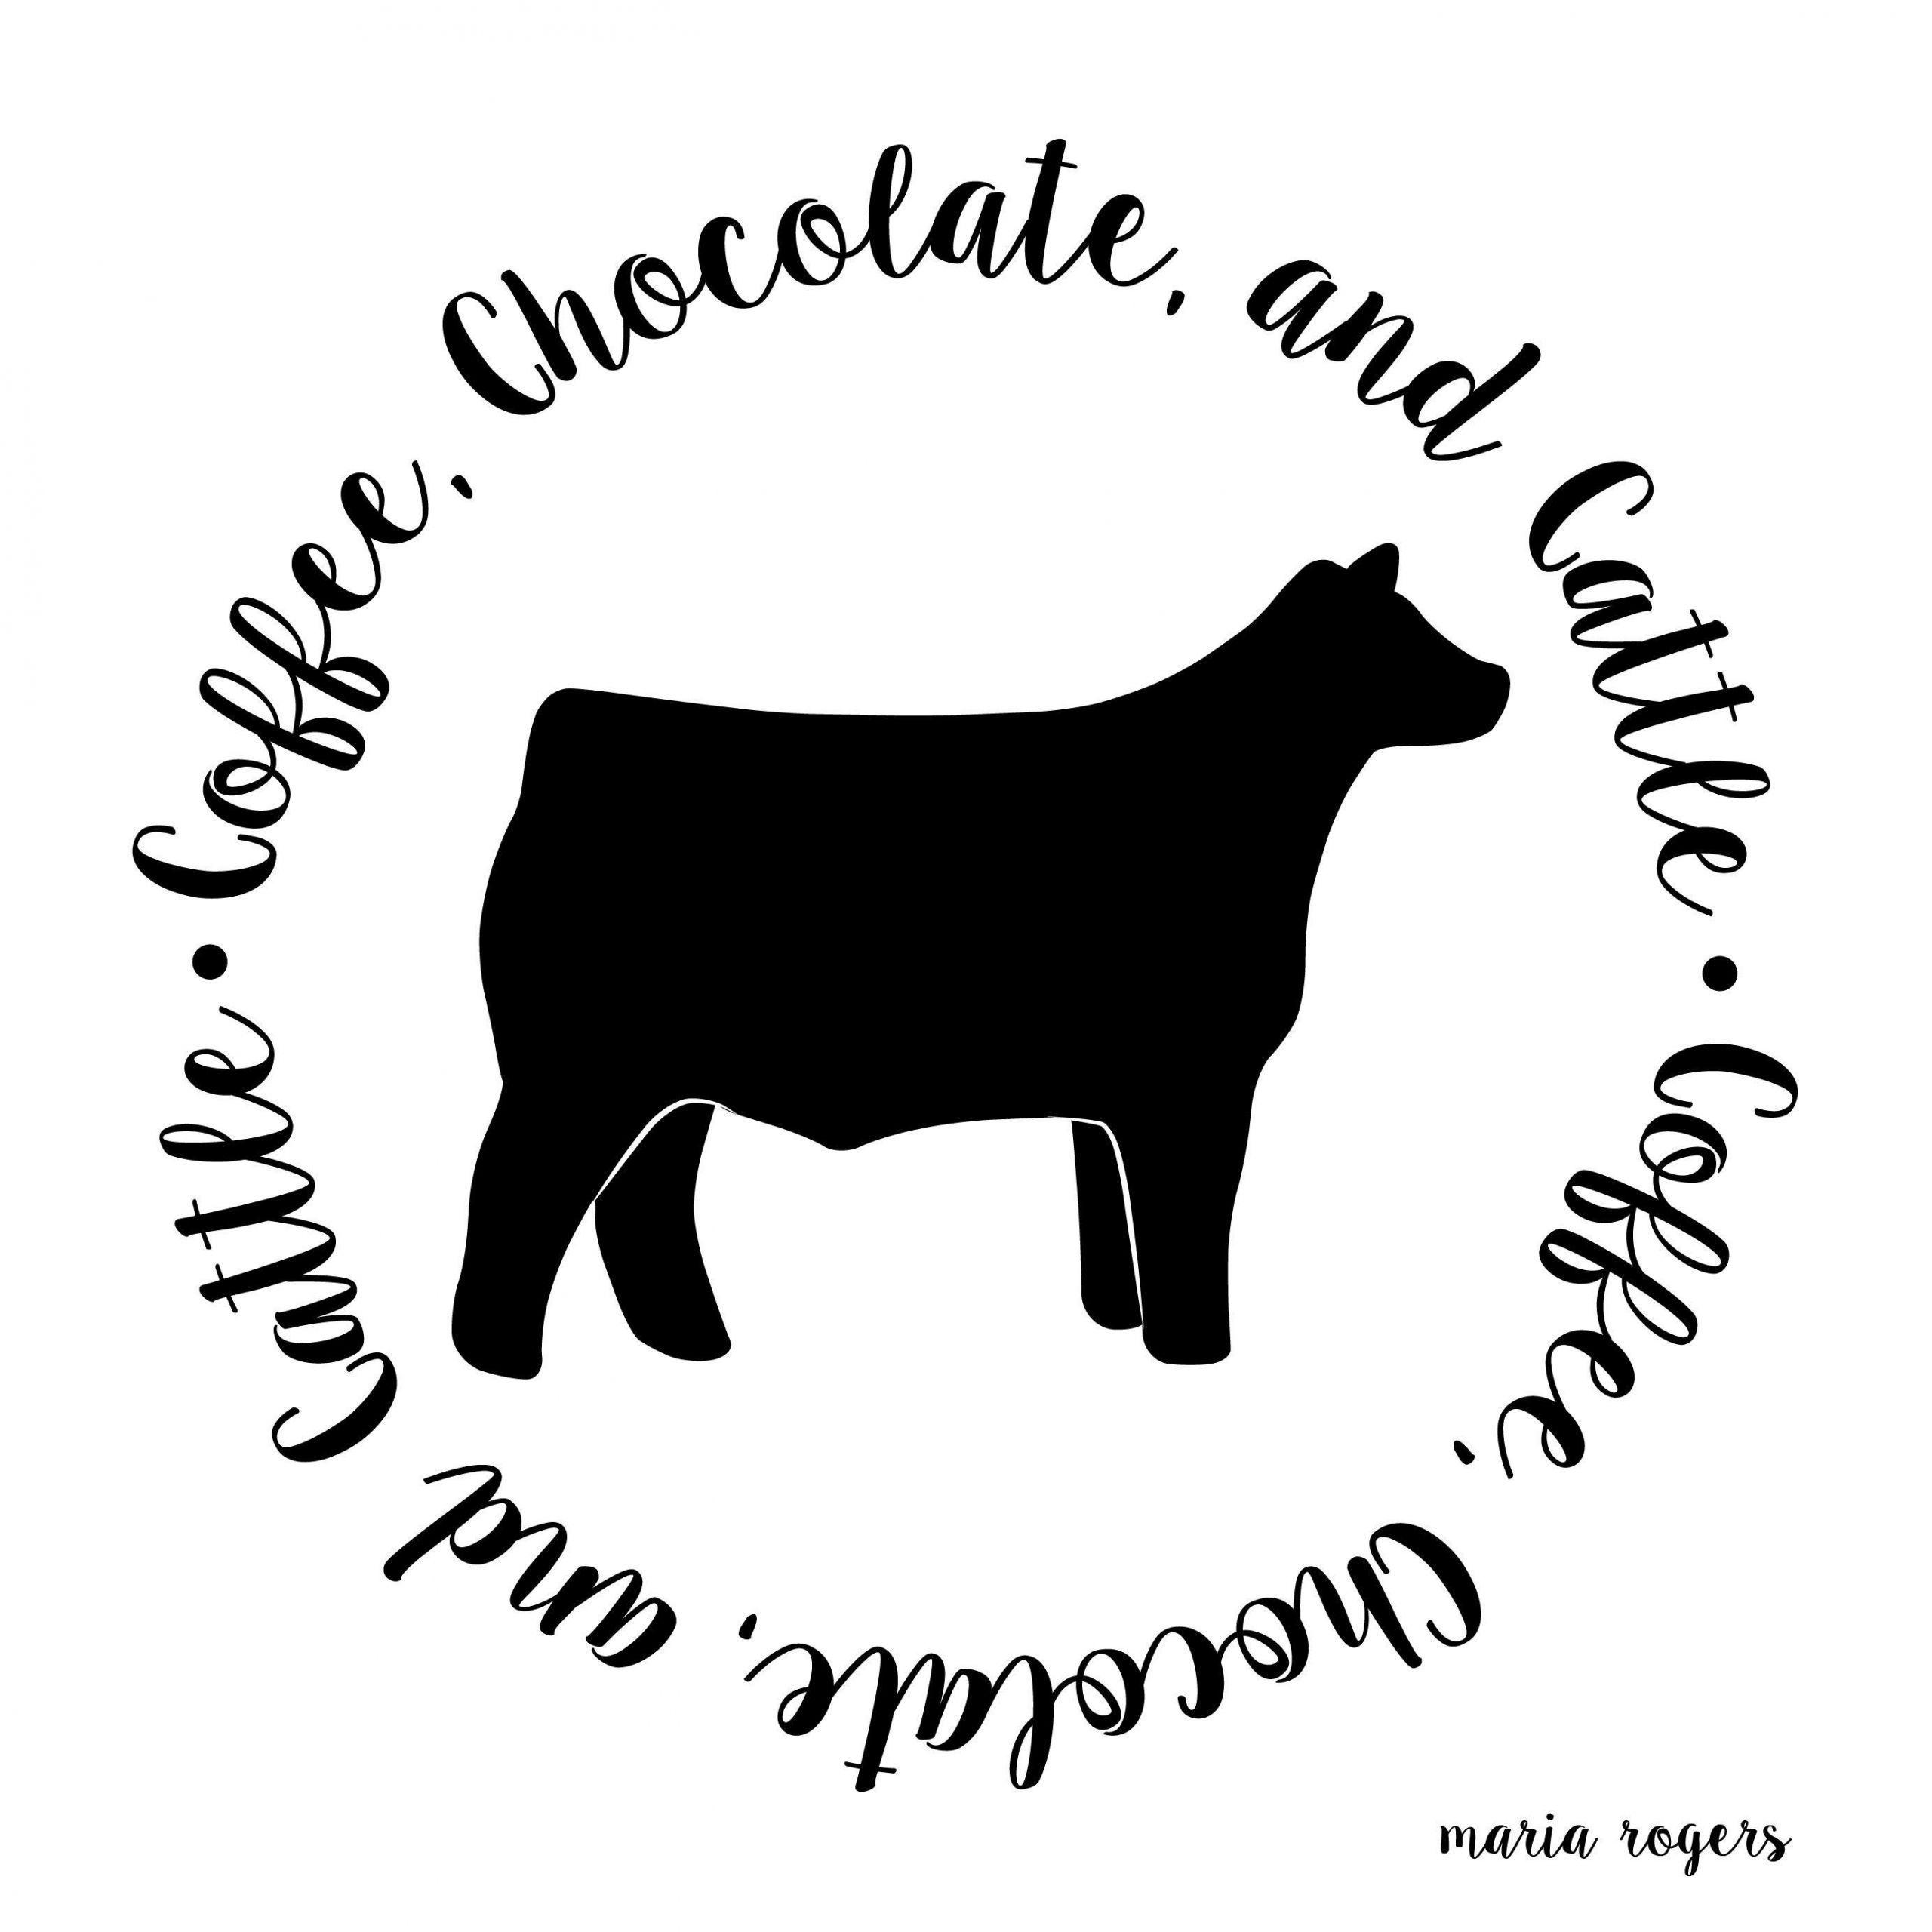 6 Cow Farm Animals Dafba D62e44bbf1c125abdf